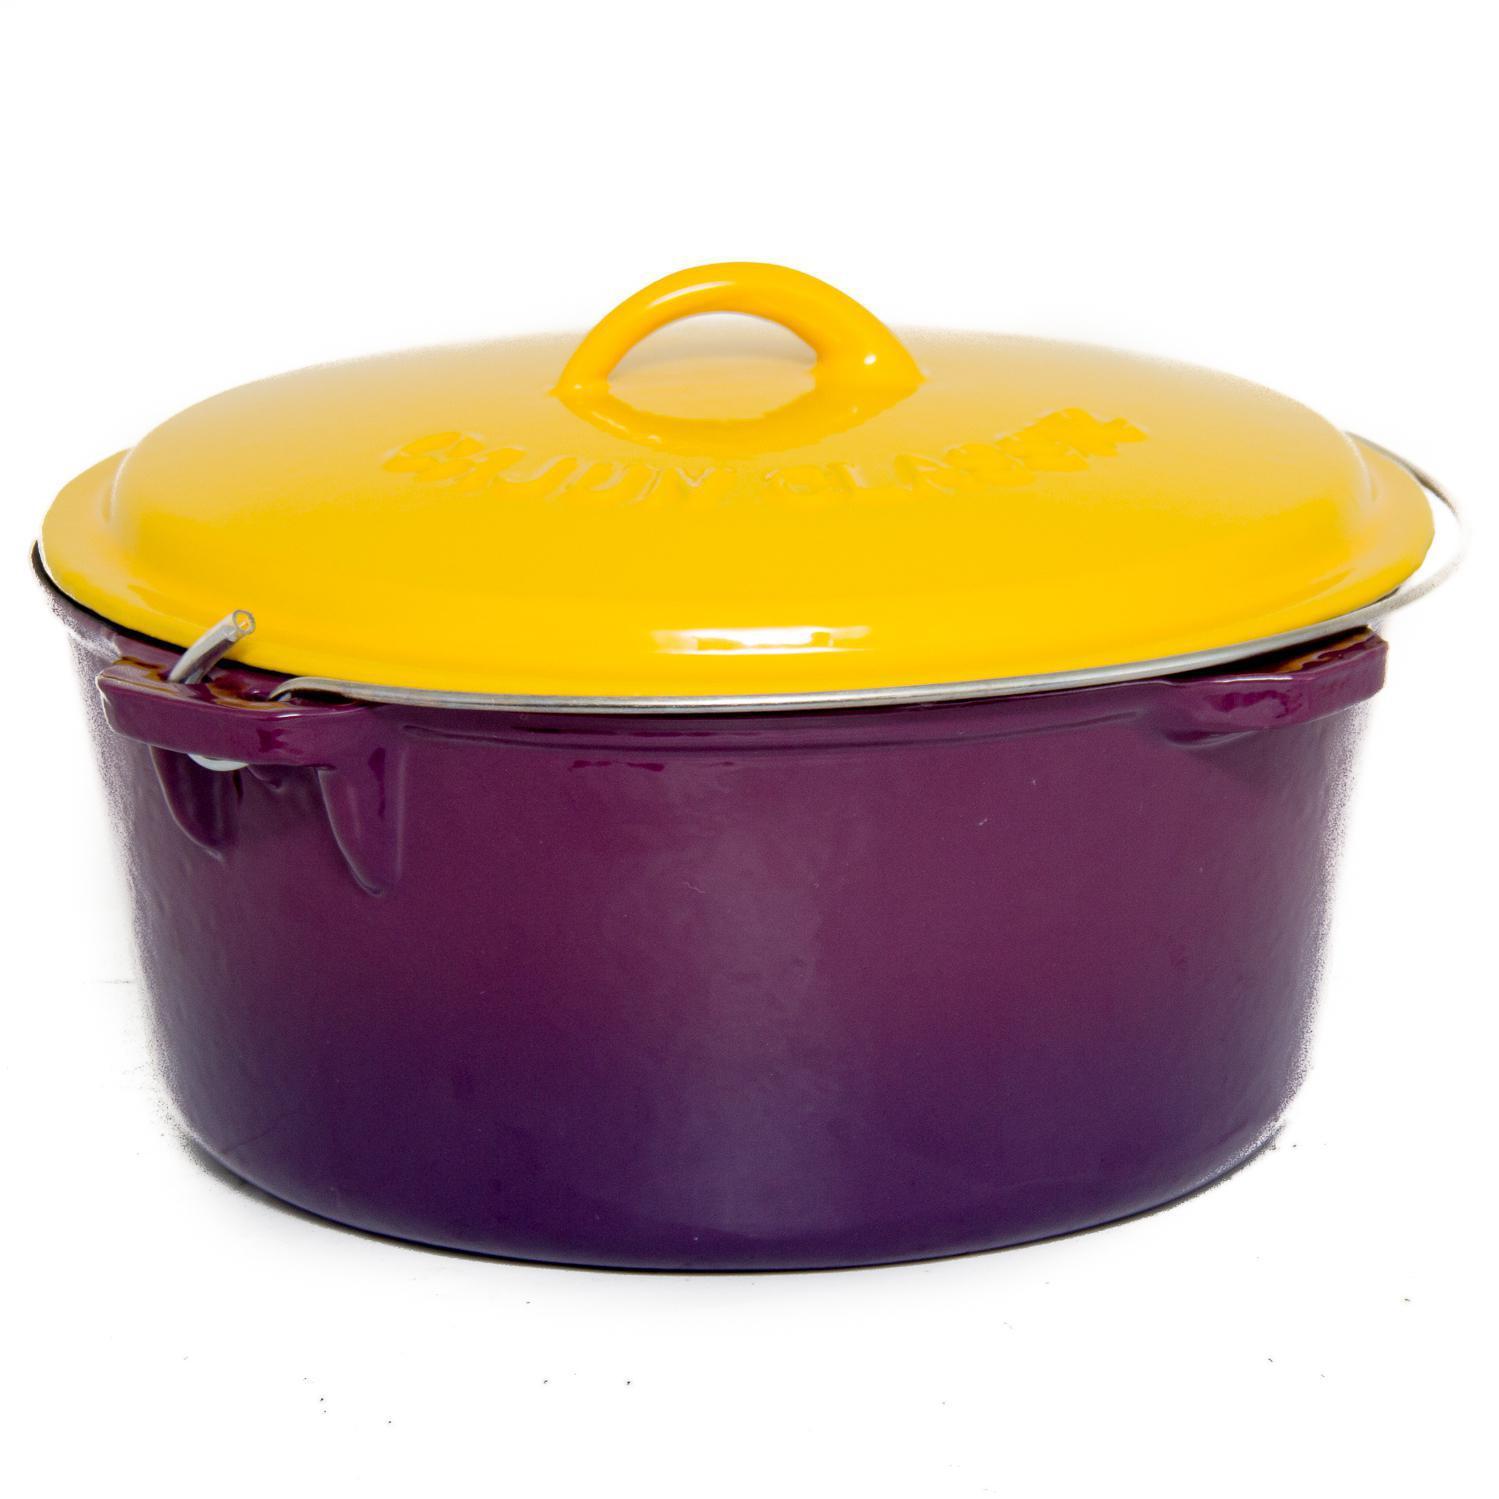 cajun cookware 16 quart enamel cast iron dutch oven purple gold gl10490pg ebay. Black Bedroom Furniture Sets. Home Design Ideas